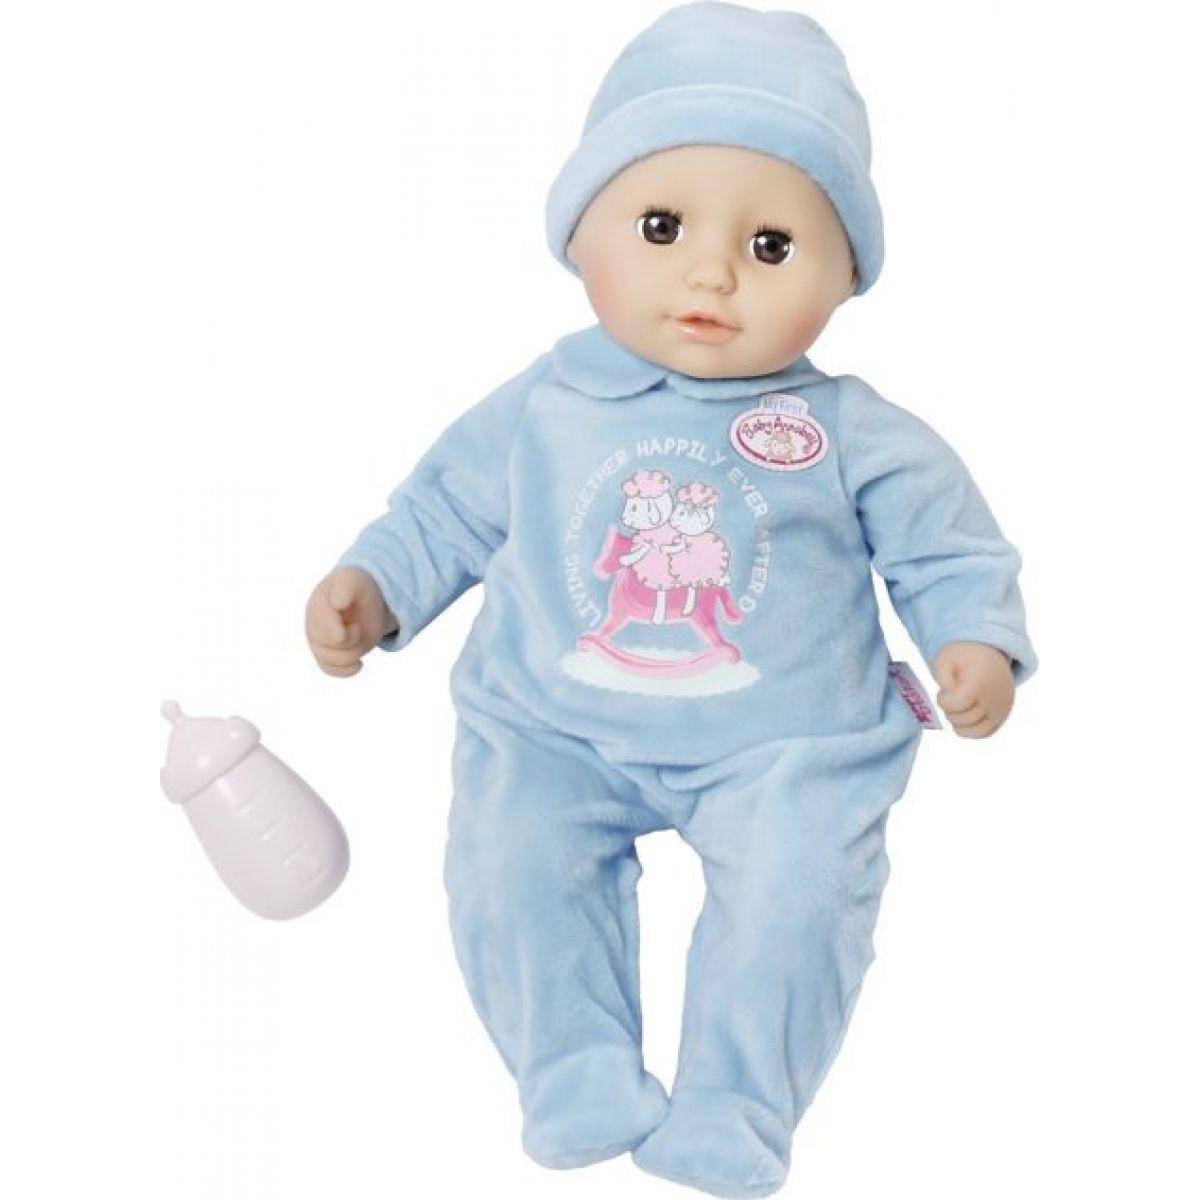 Zapf Creation Baby Annabell Little Alexander 36cm